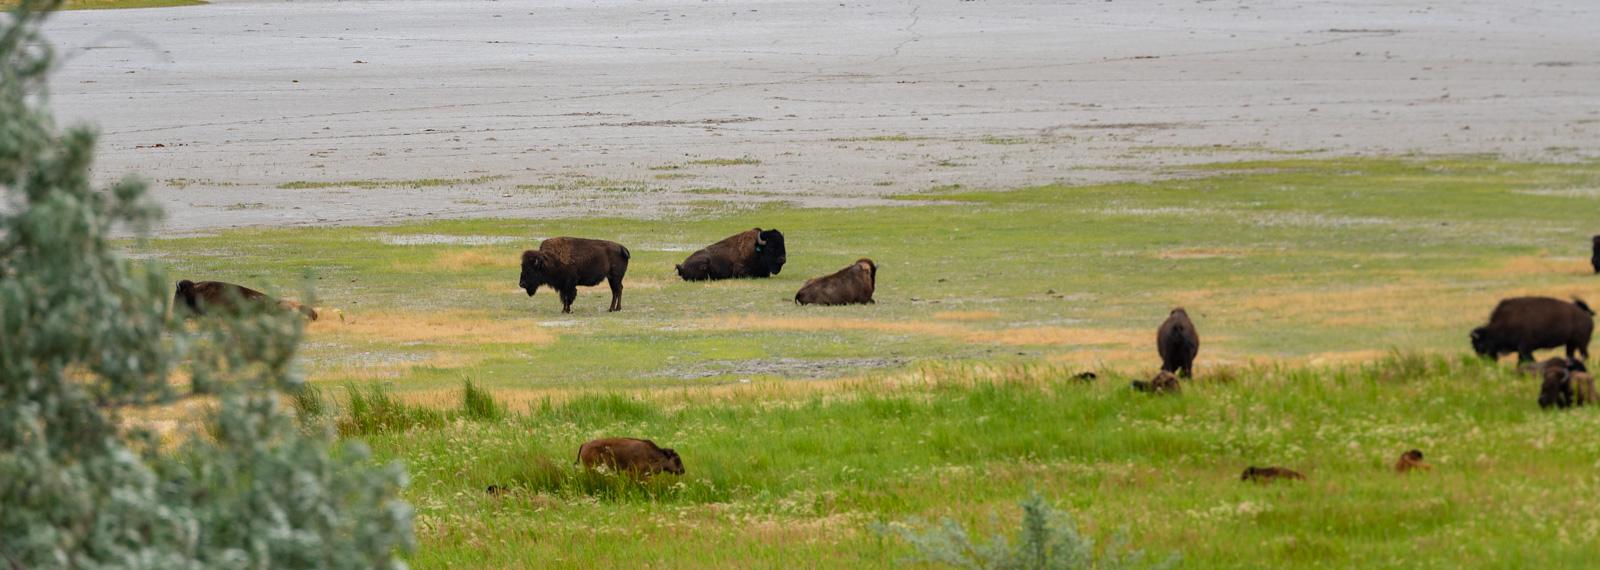 Buffalo on the beach of the Great Salt Lake.